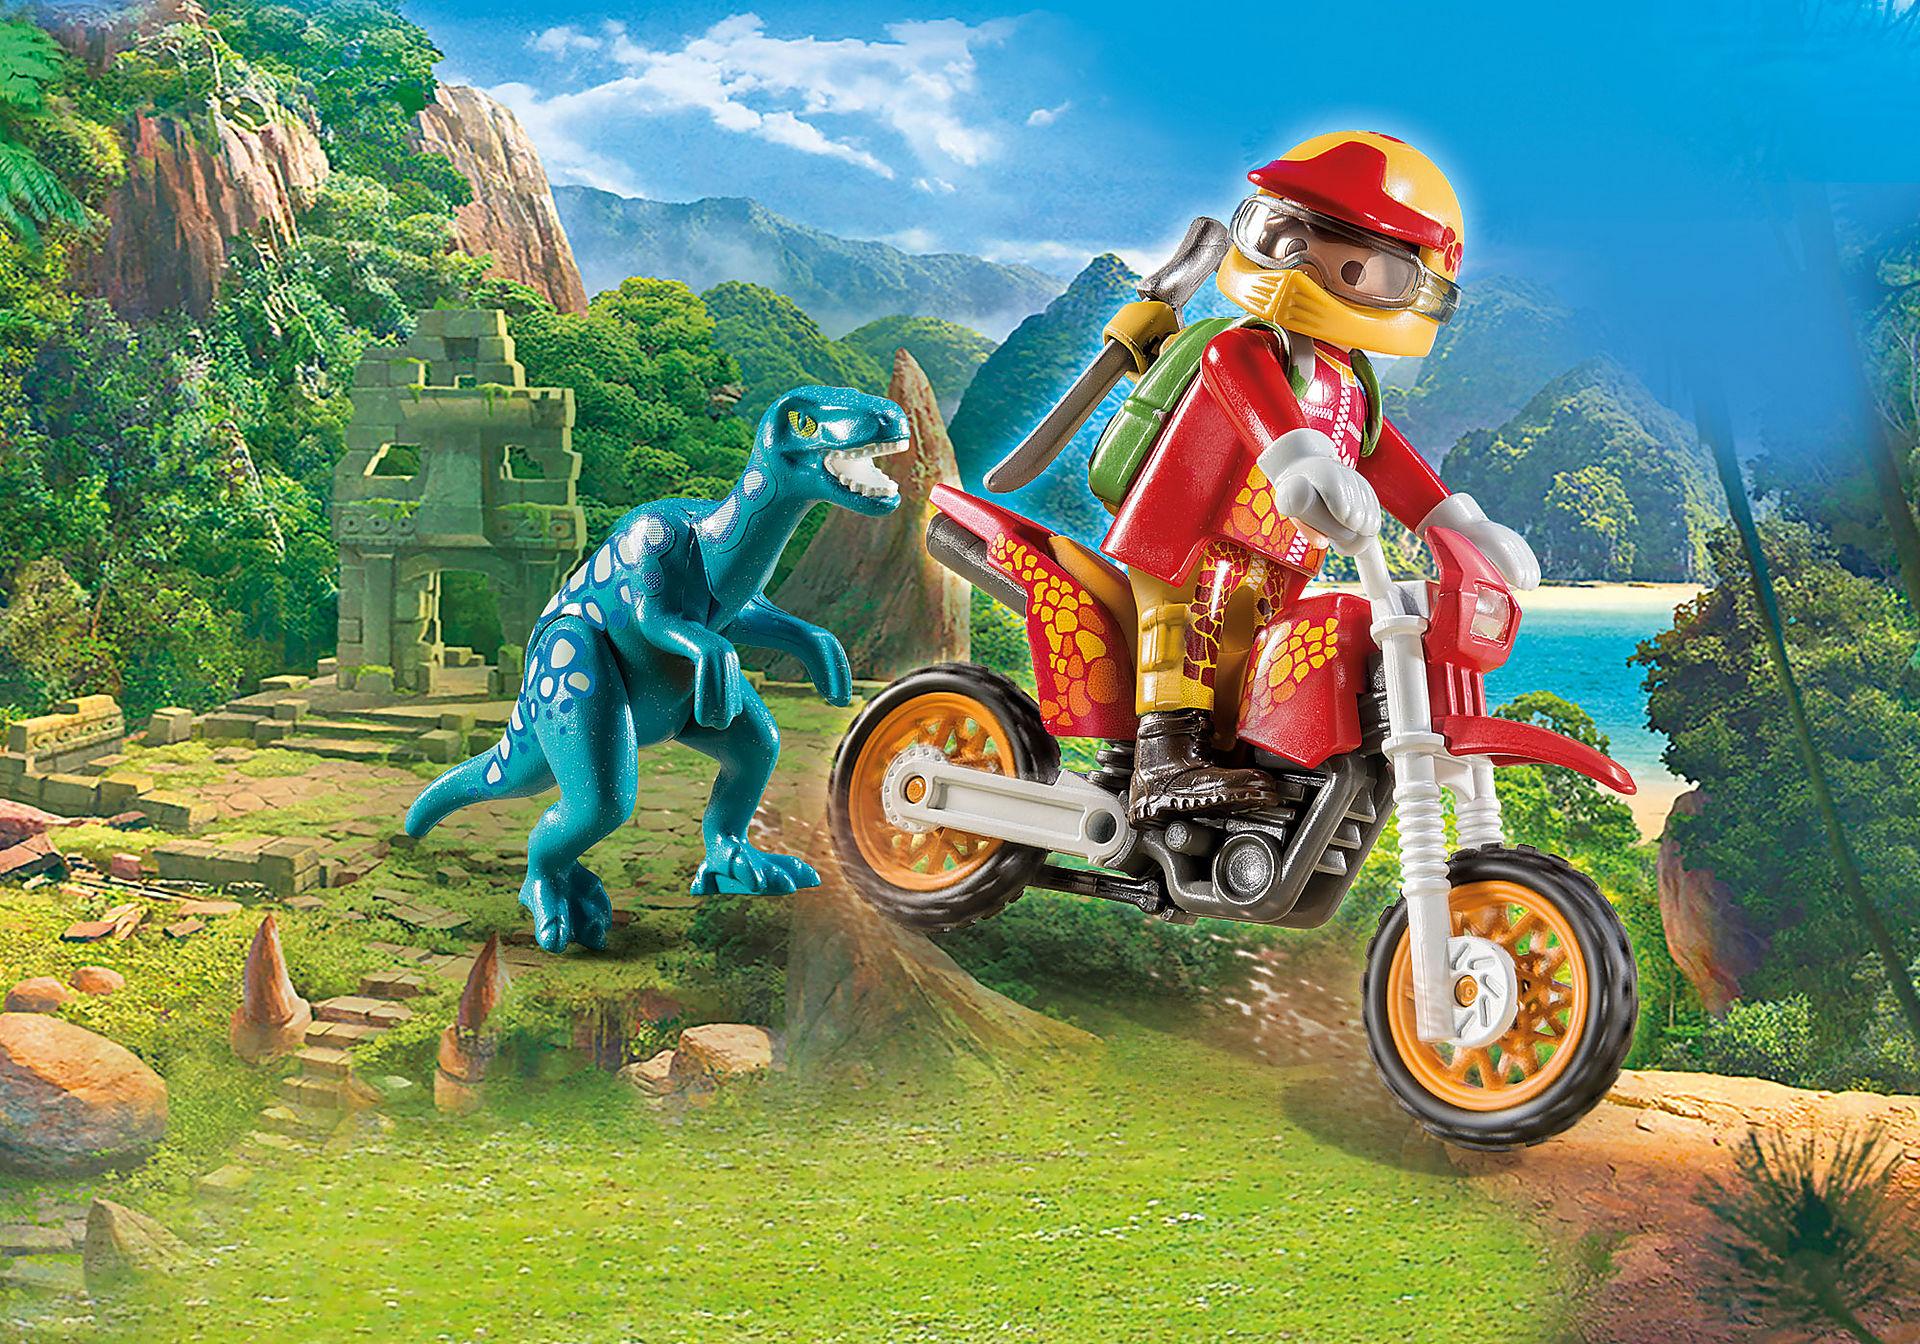 9431 Pilote de moto et raptor zoom image1